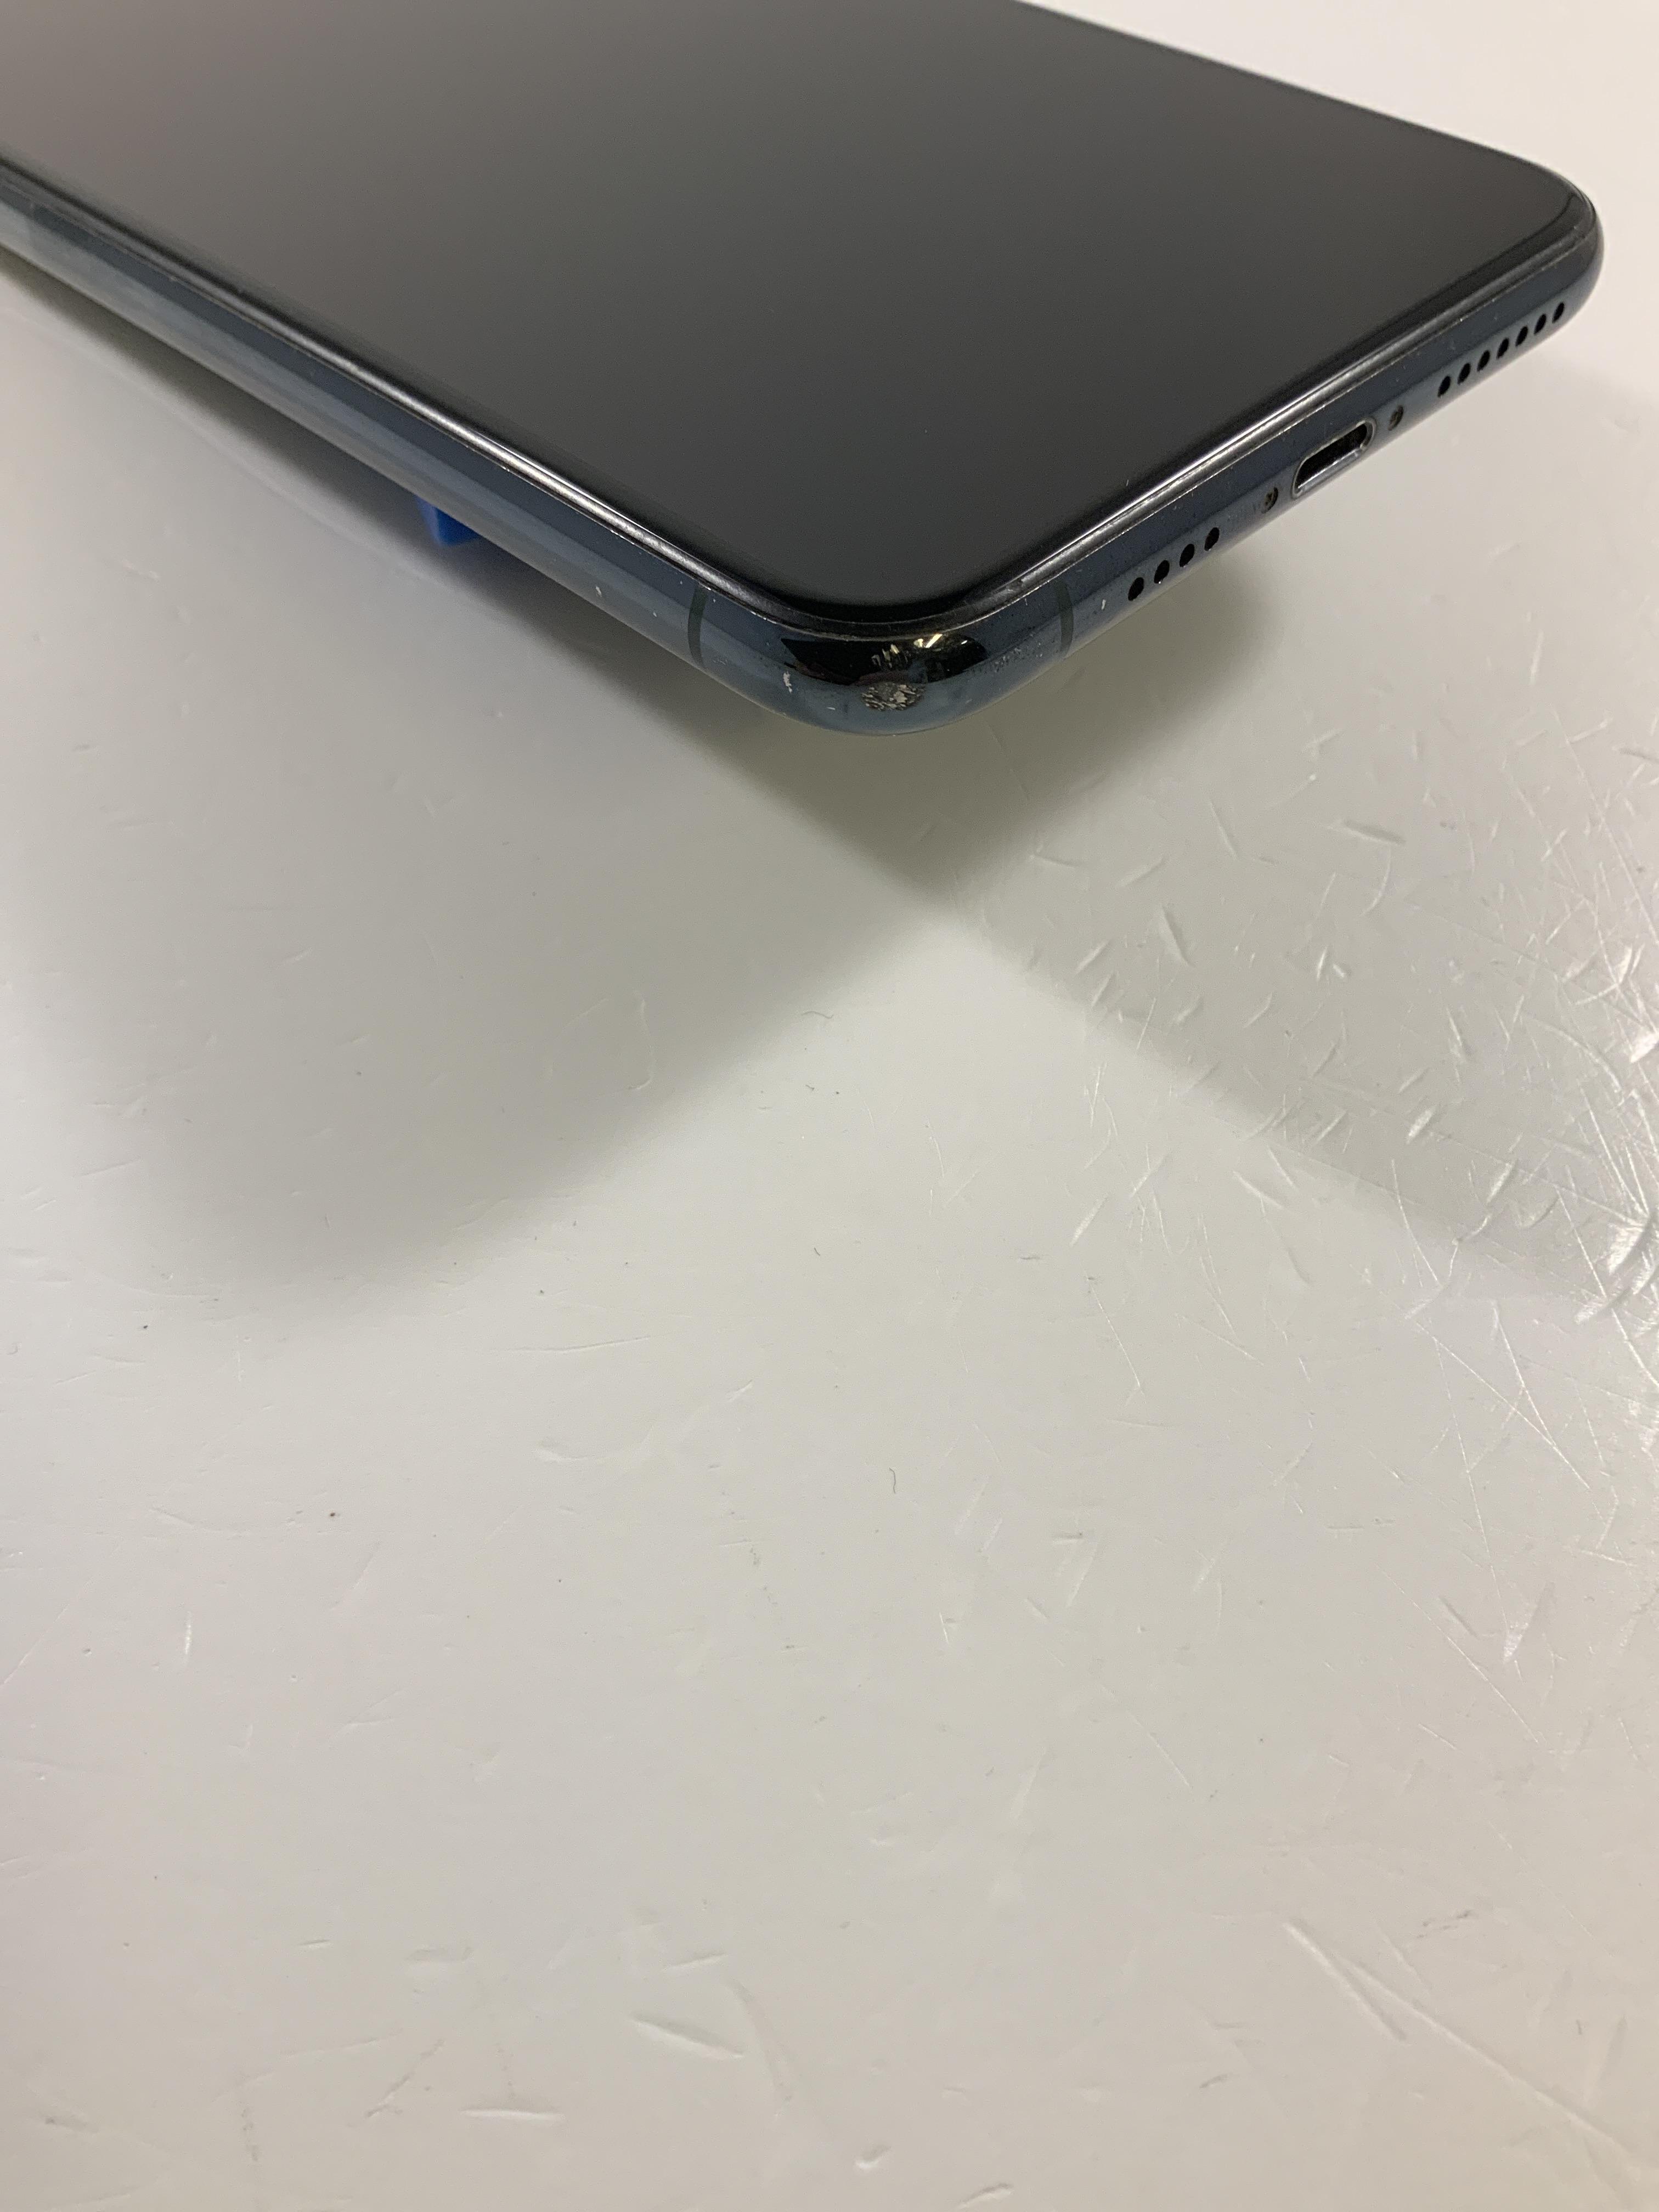 iPhone 11 Pro Max 64GB, 64GB, Midnight Green, image 4